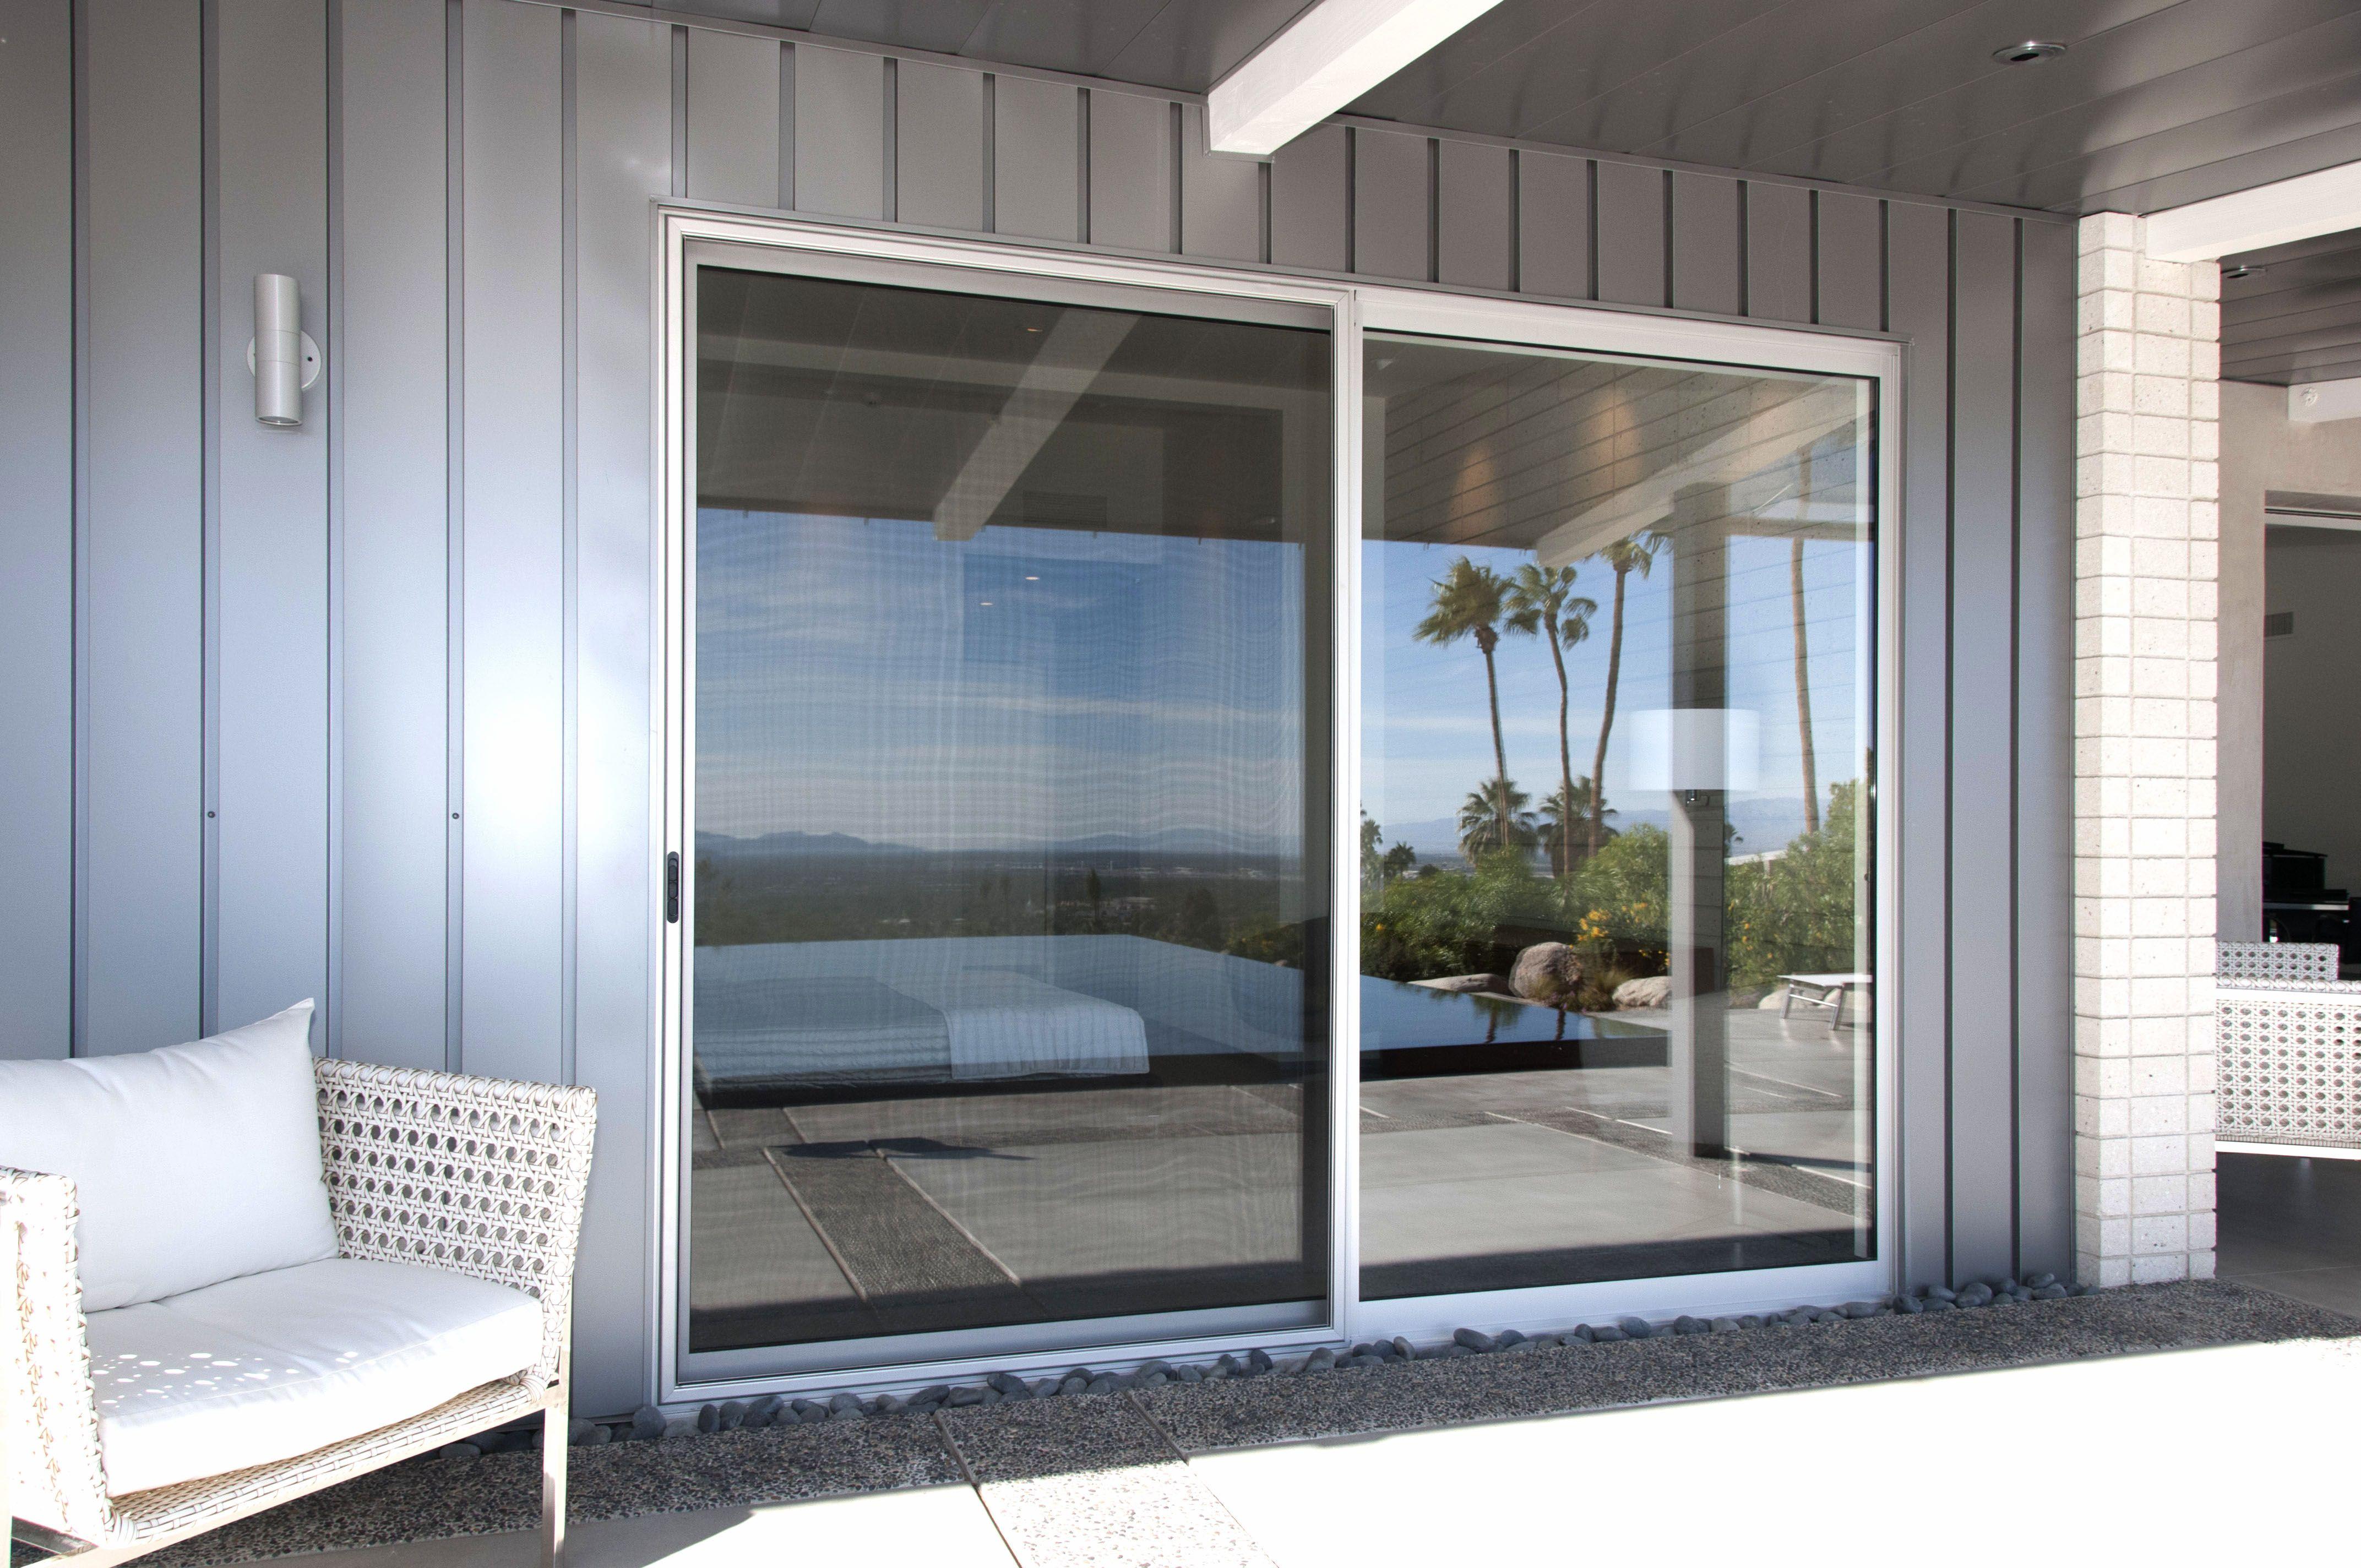 Sliding Glass Door Alarm House Interior Design Pinterest